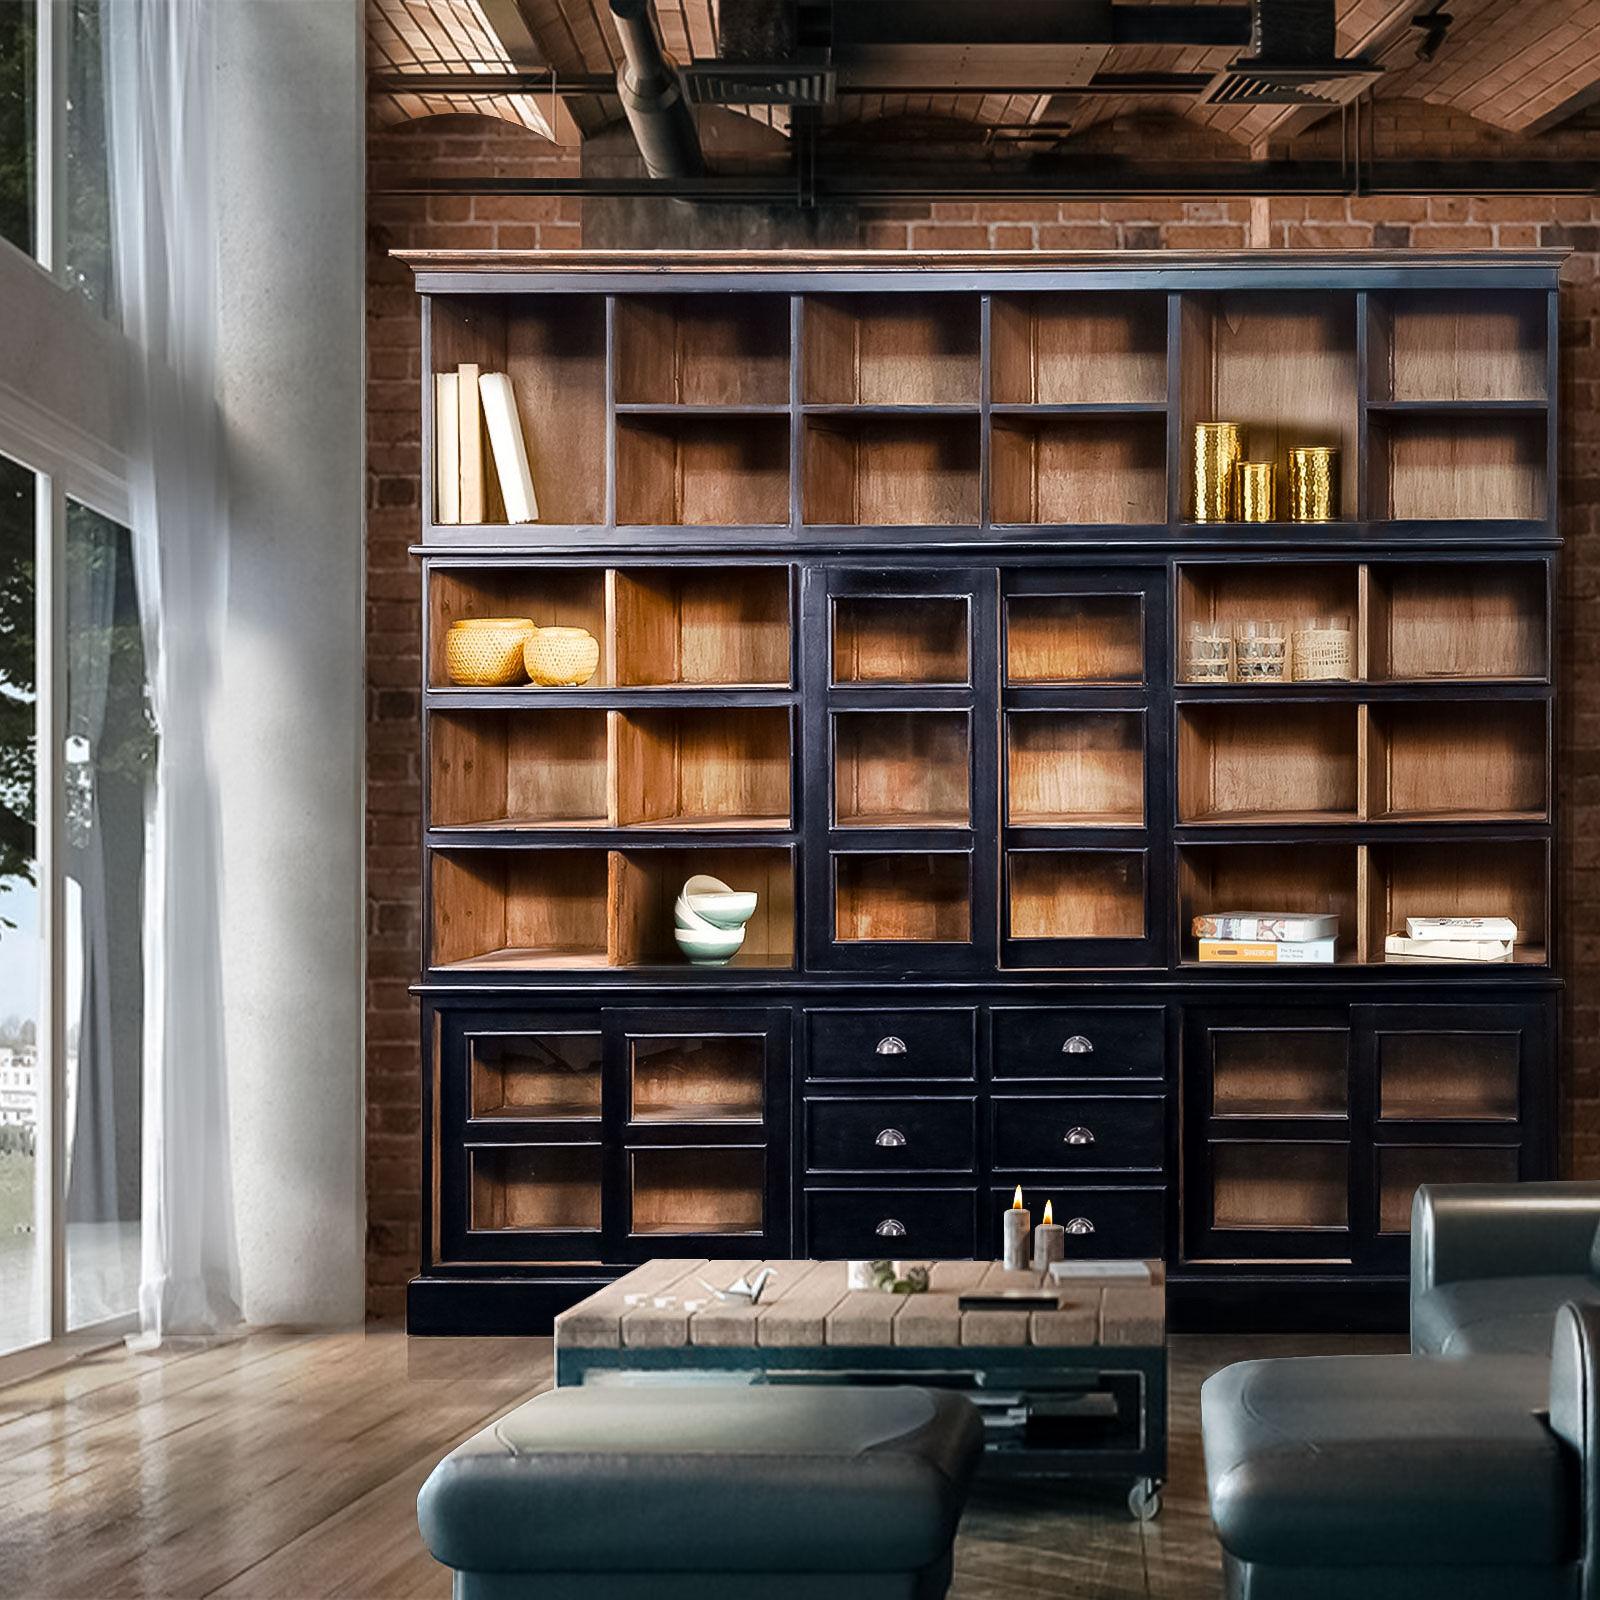 Kha Home Design Grande bibliothèque noir en bois massif GEDE  - Marron